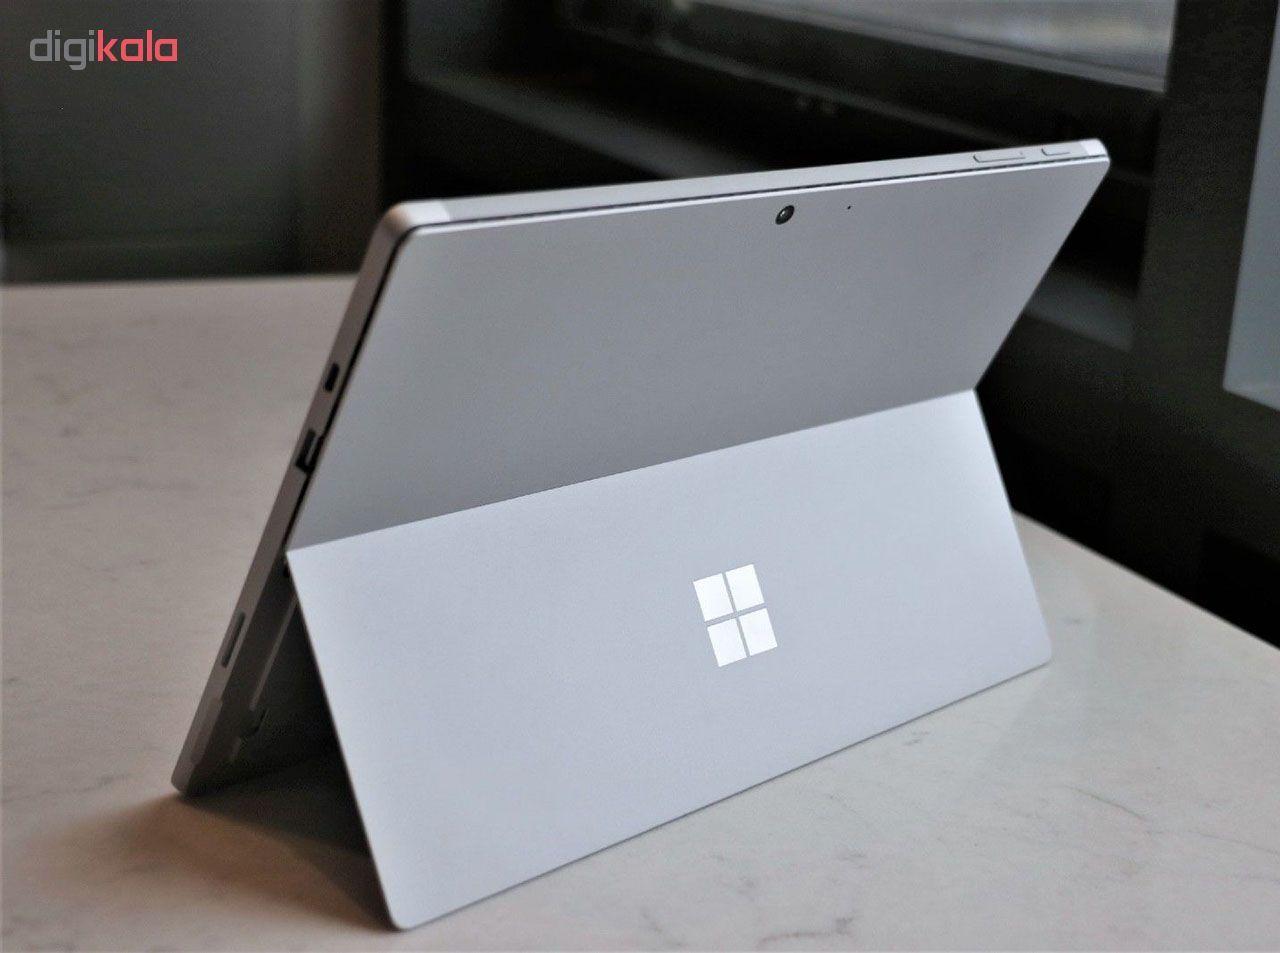 تبلت مایکروسافت مدل Surface Pro 6 - B main 1 19